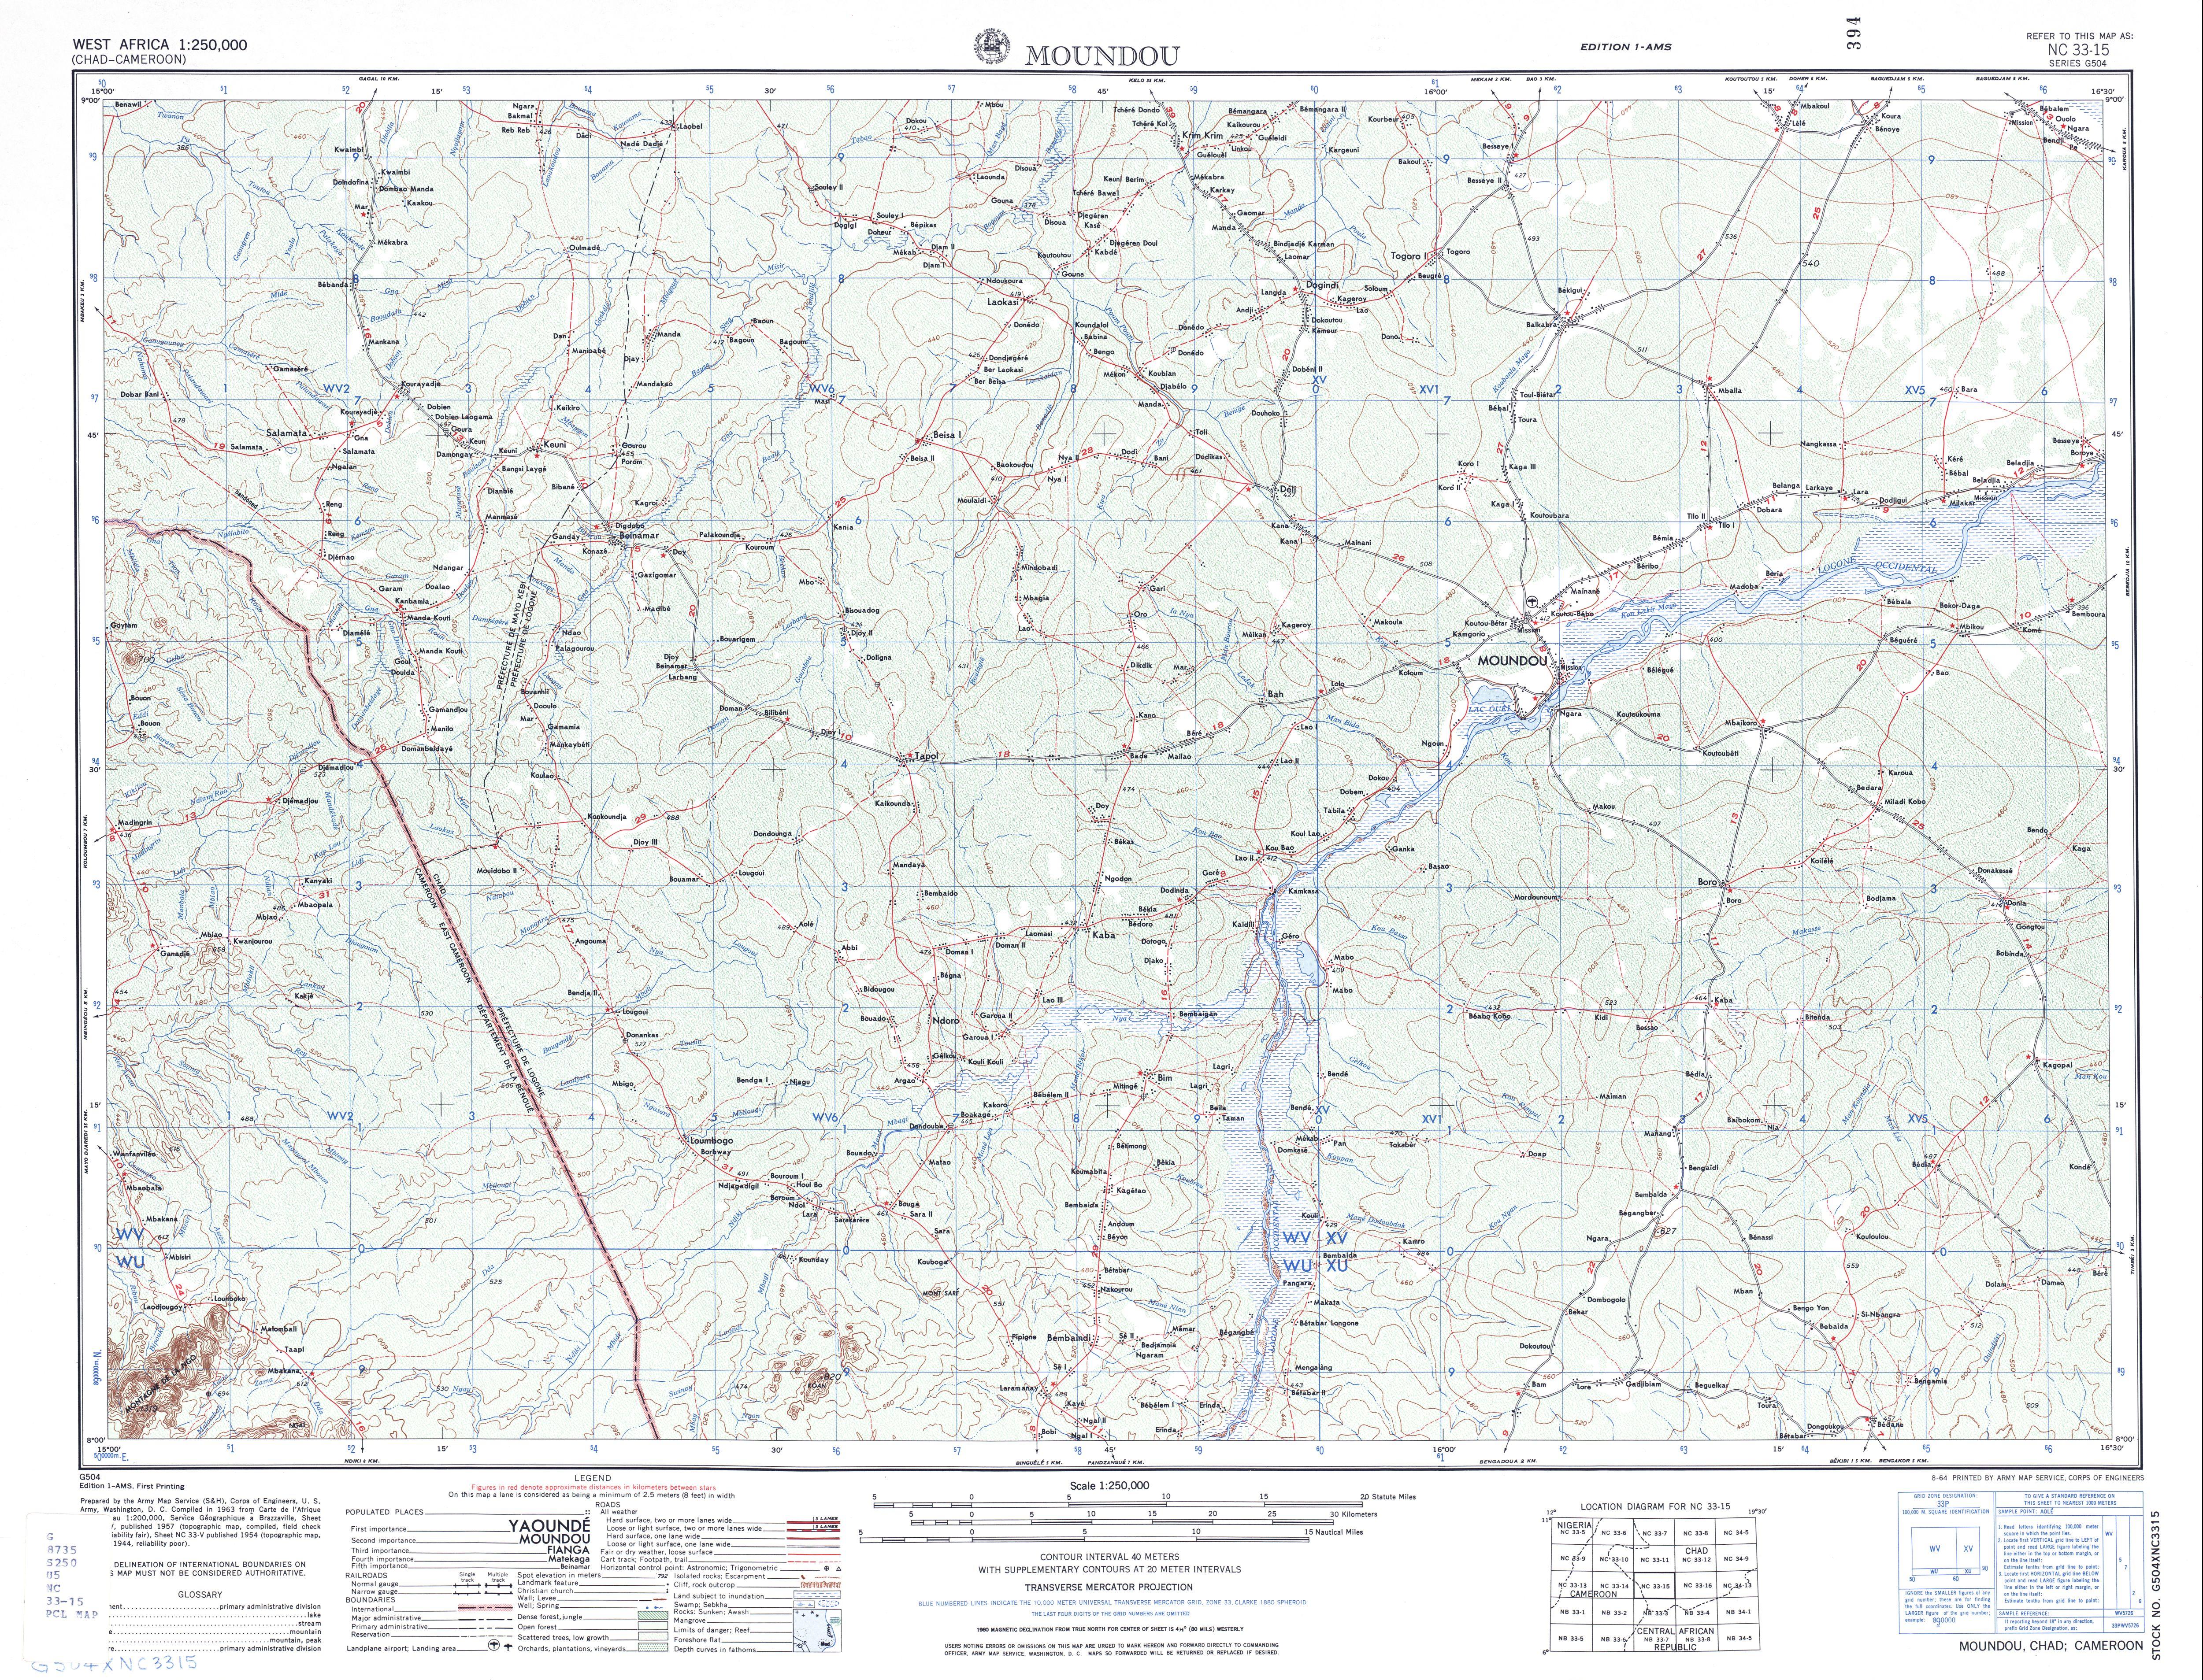 Hoja Moundou del Mapa Topográfico de África Occidental 1955